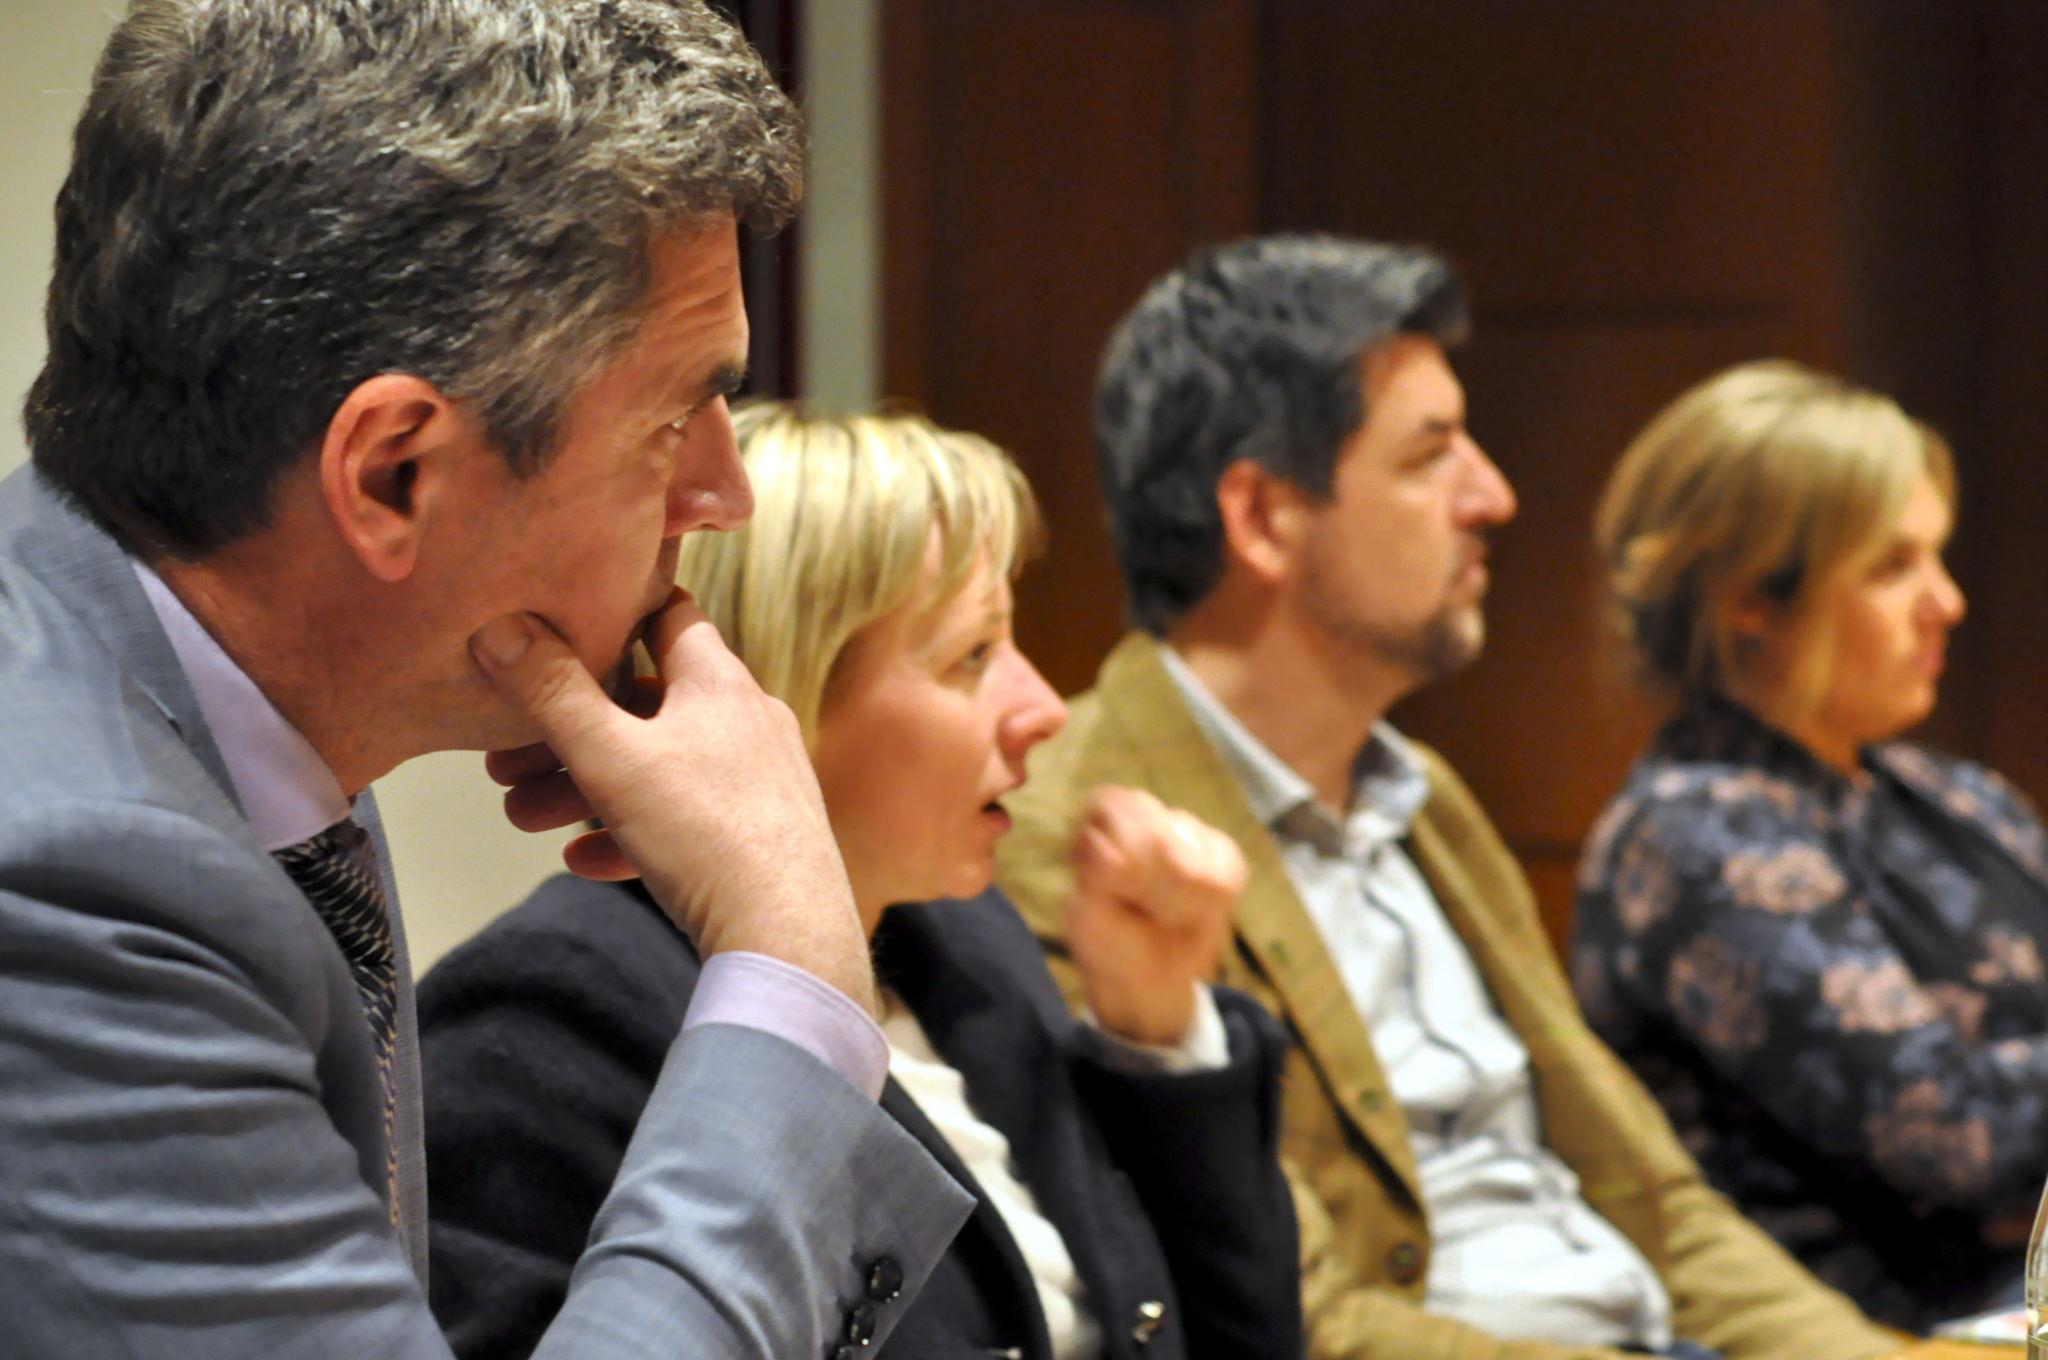 SVP-Bezirk Brixen nominiert Herbert Dorfmann für EU-Wahl